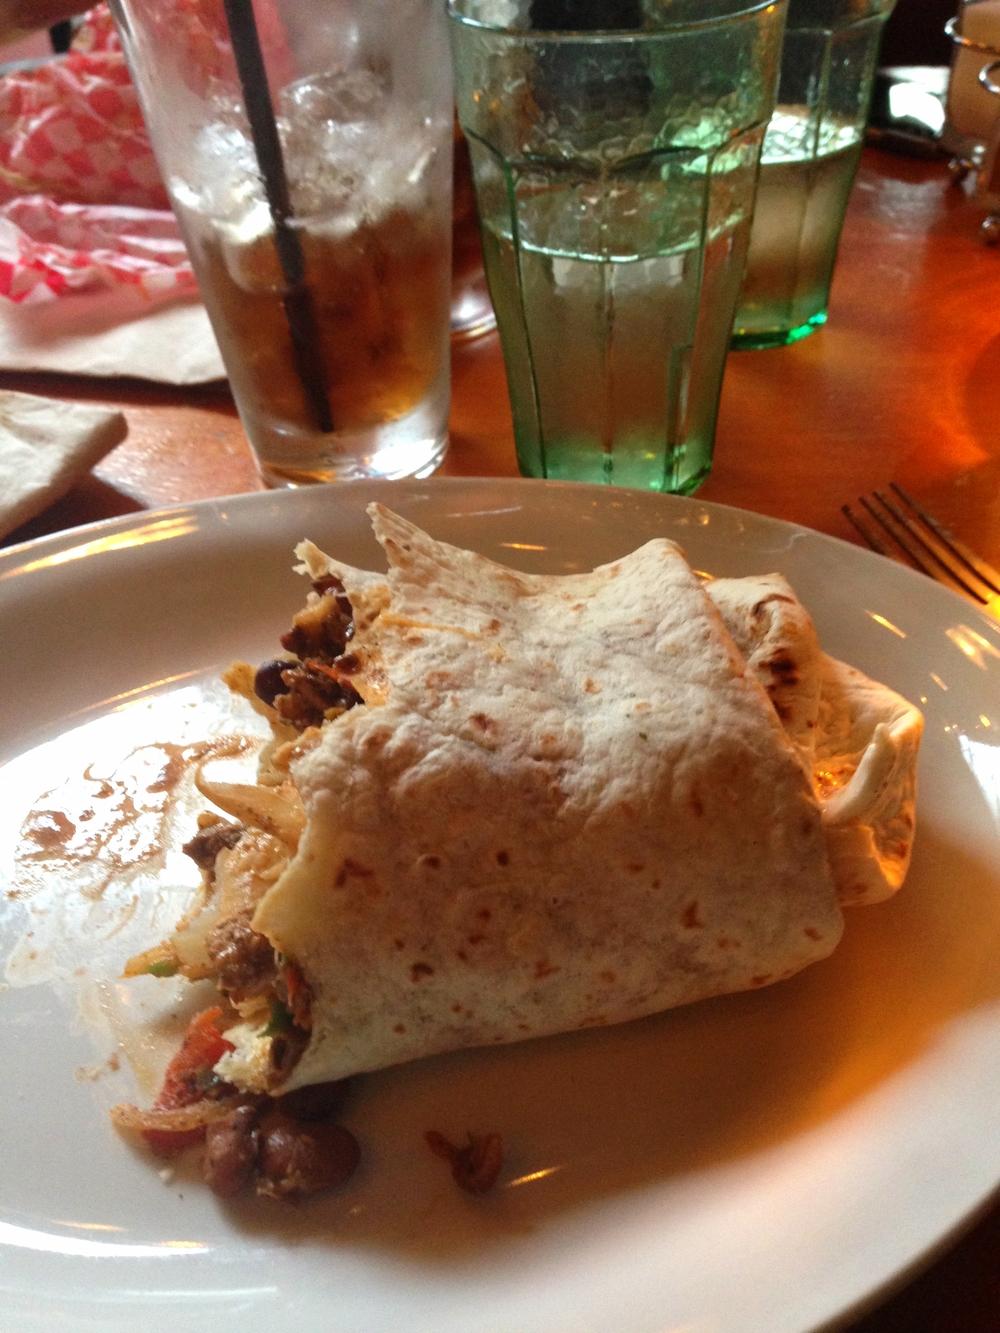 Half eaten fajita burrito